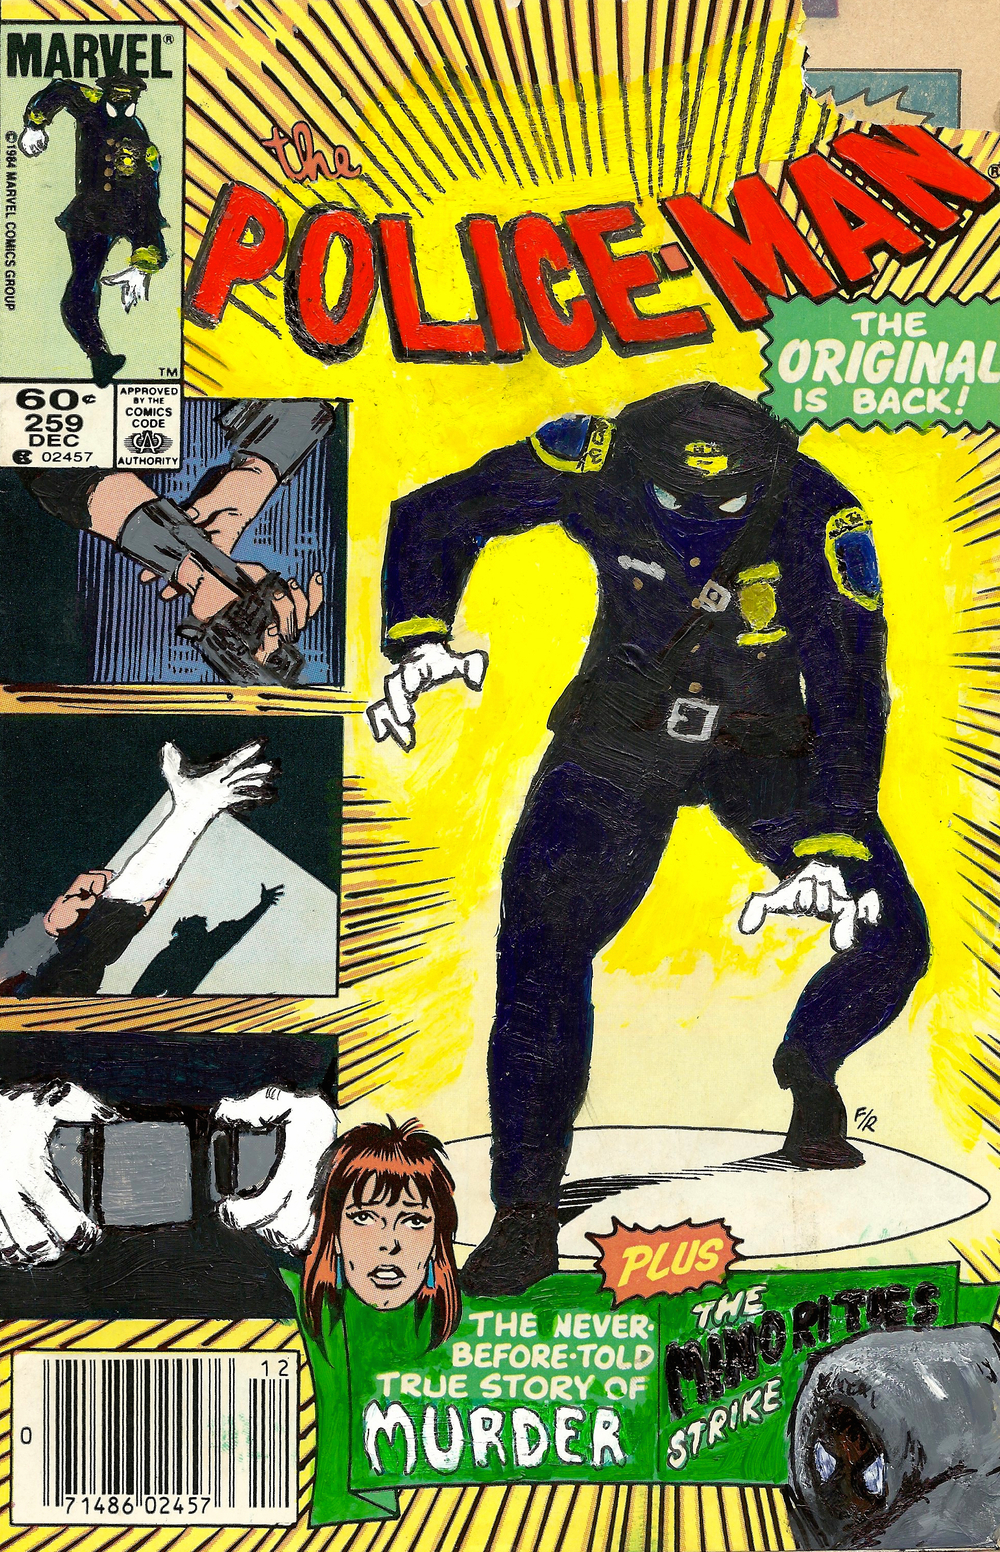 Police-Man #259